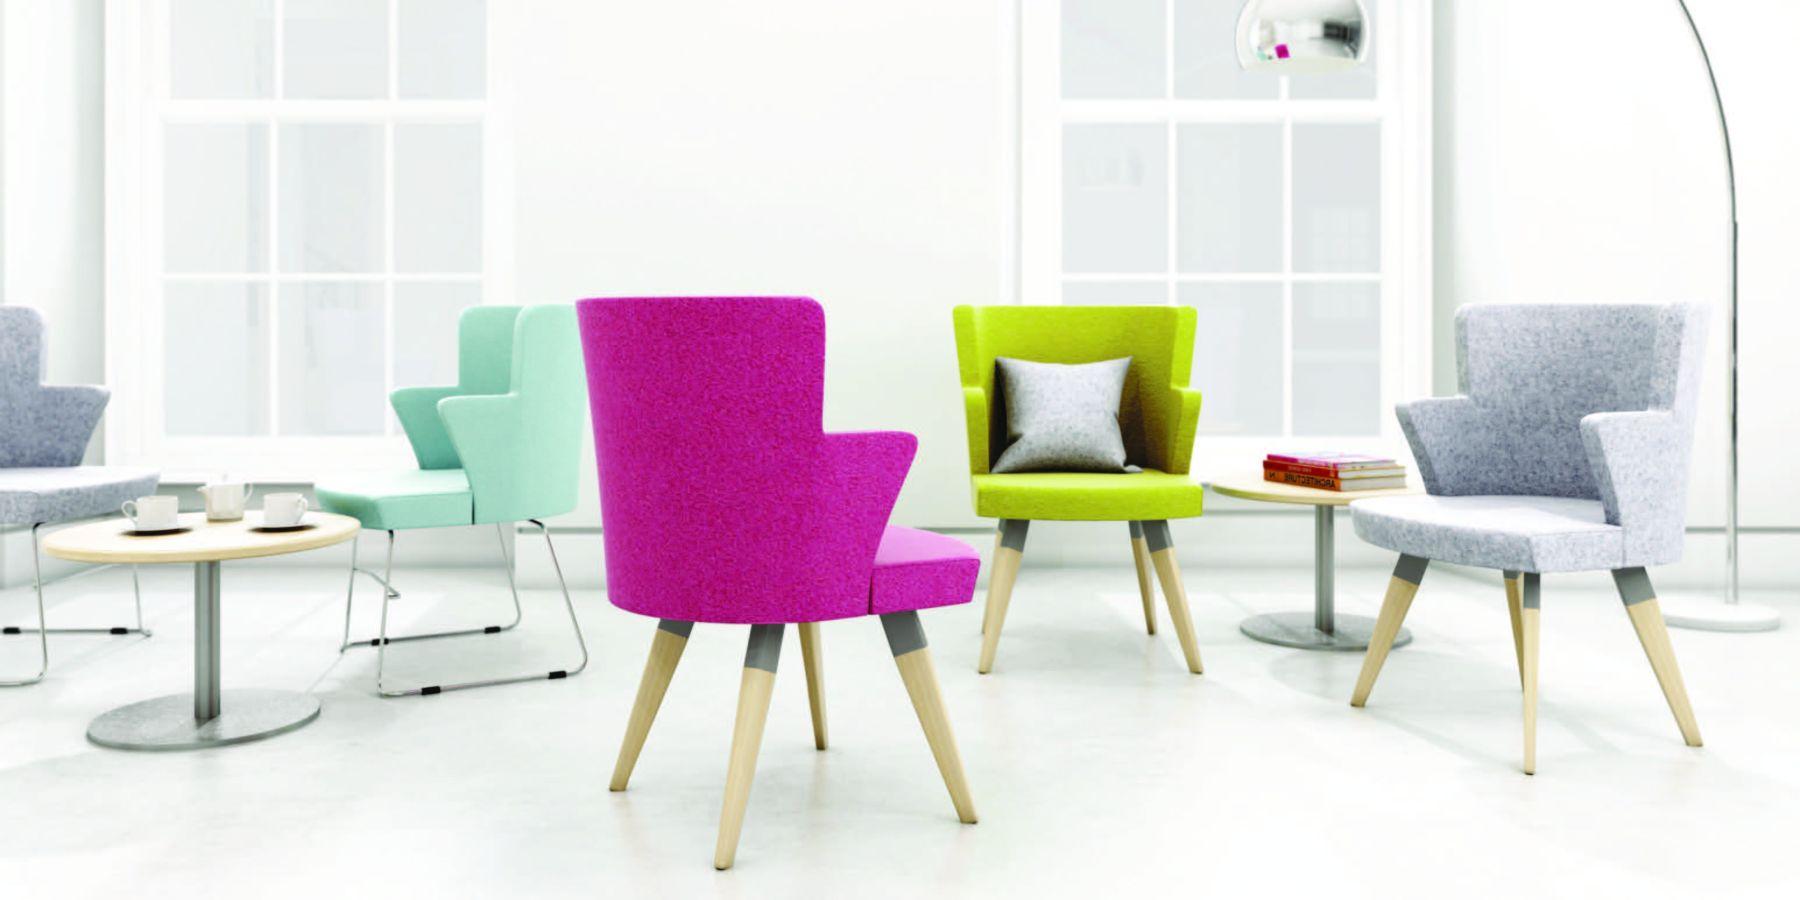 modular soft singular bright coloured chairs